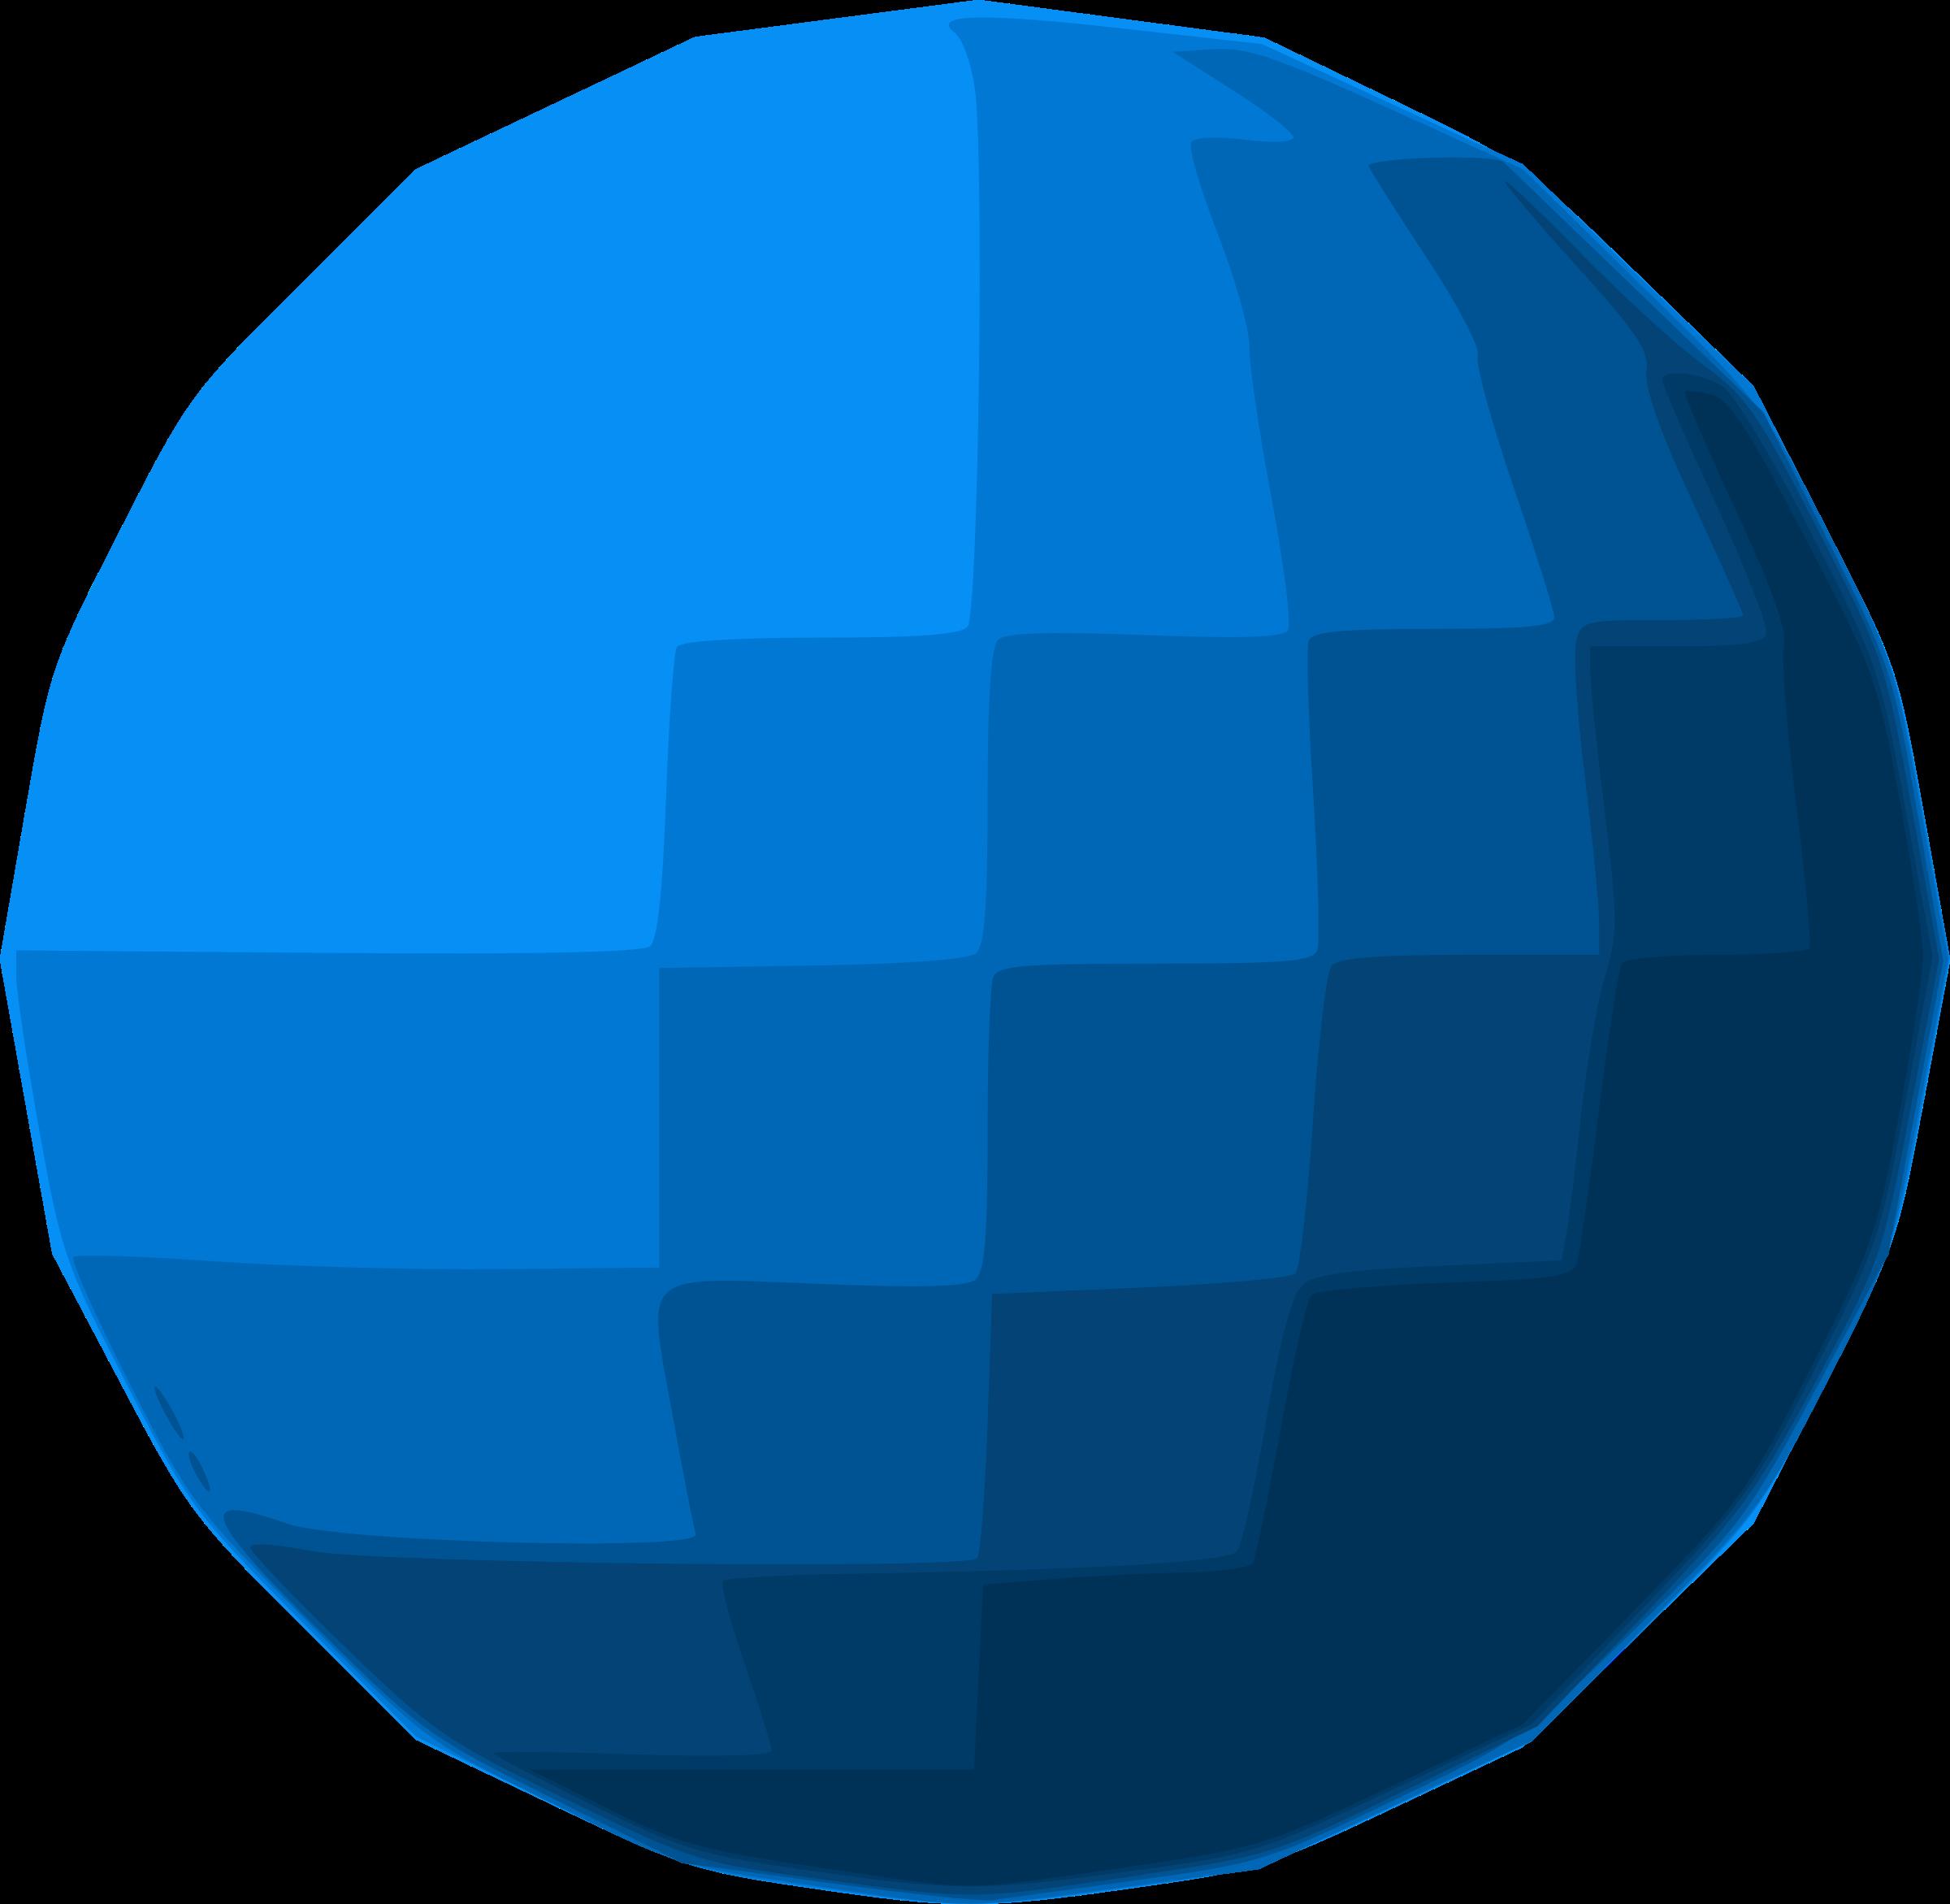 Ball clipart sphere. Blue disco big image